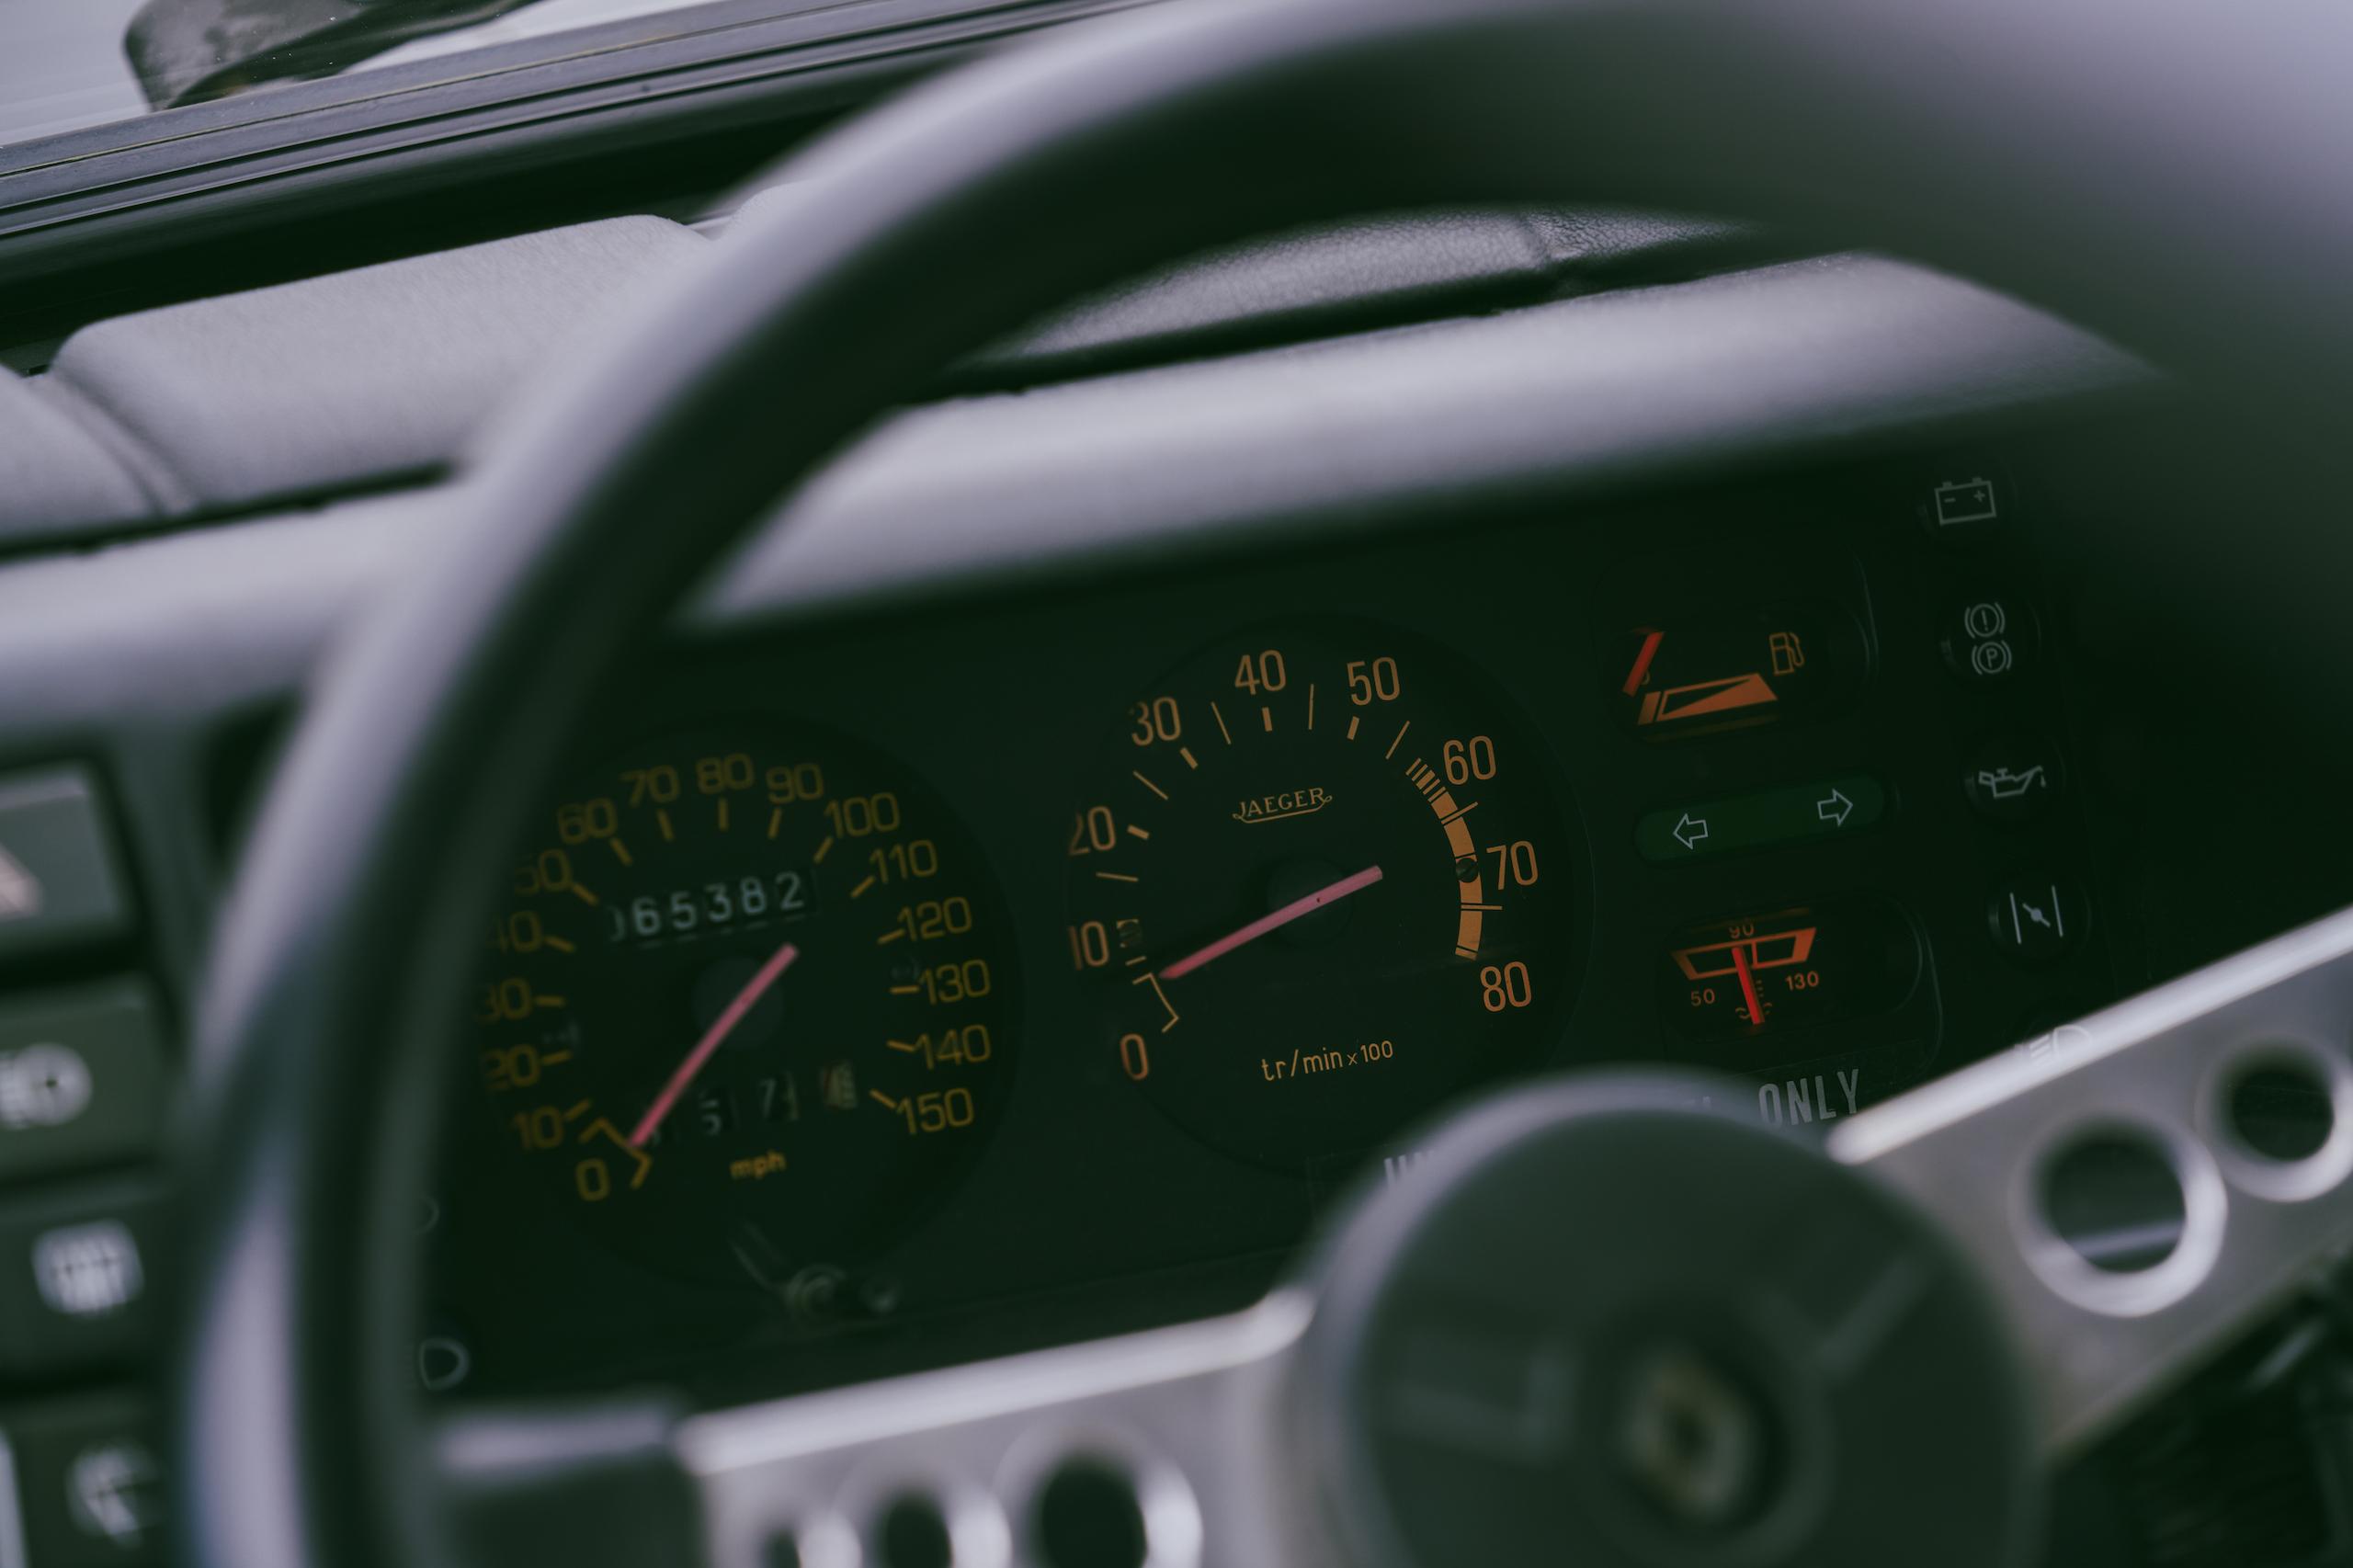 1985 Renault R5 Turbo 2 interior gauges detail